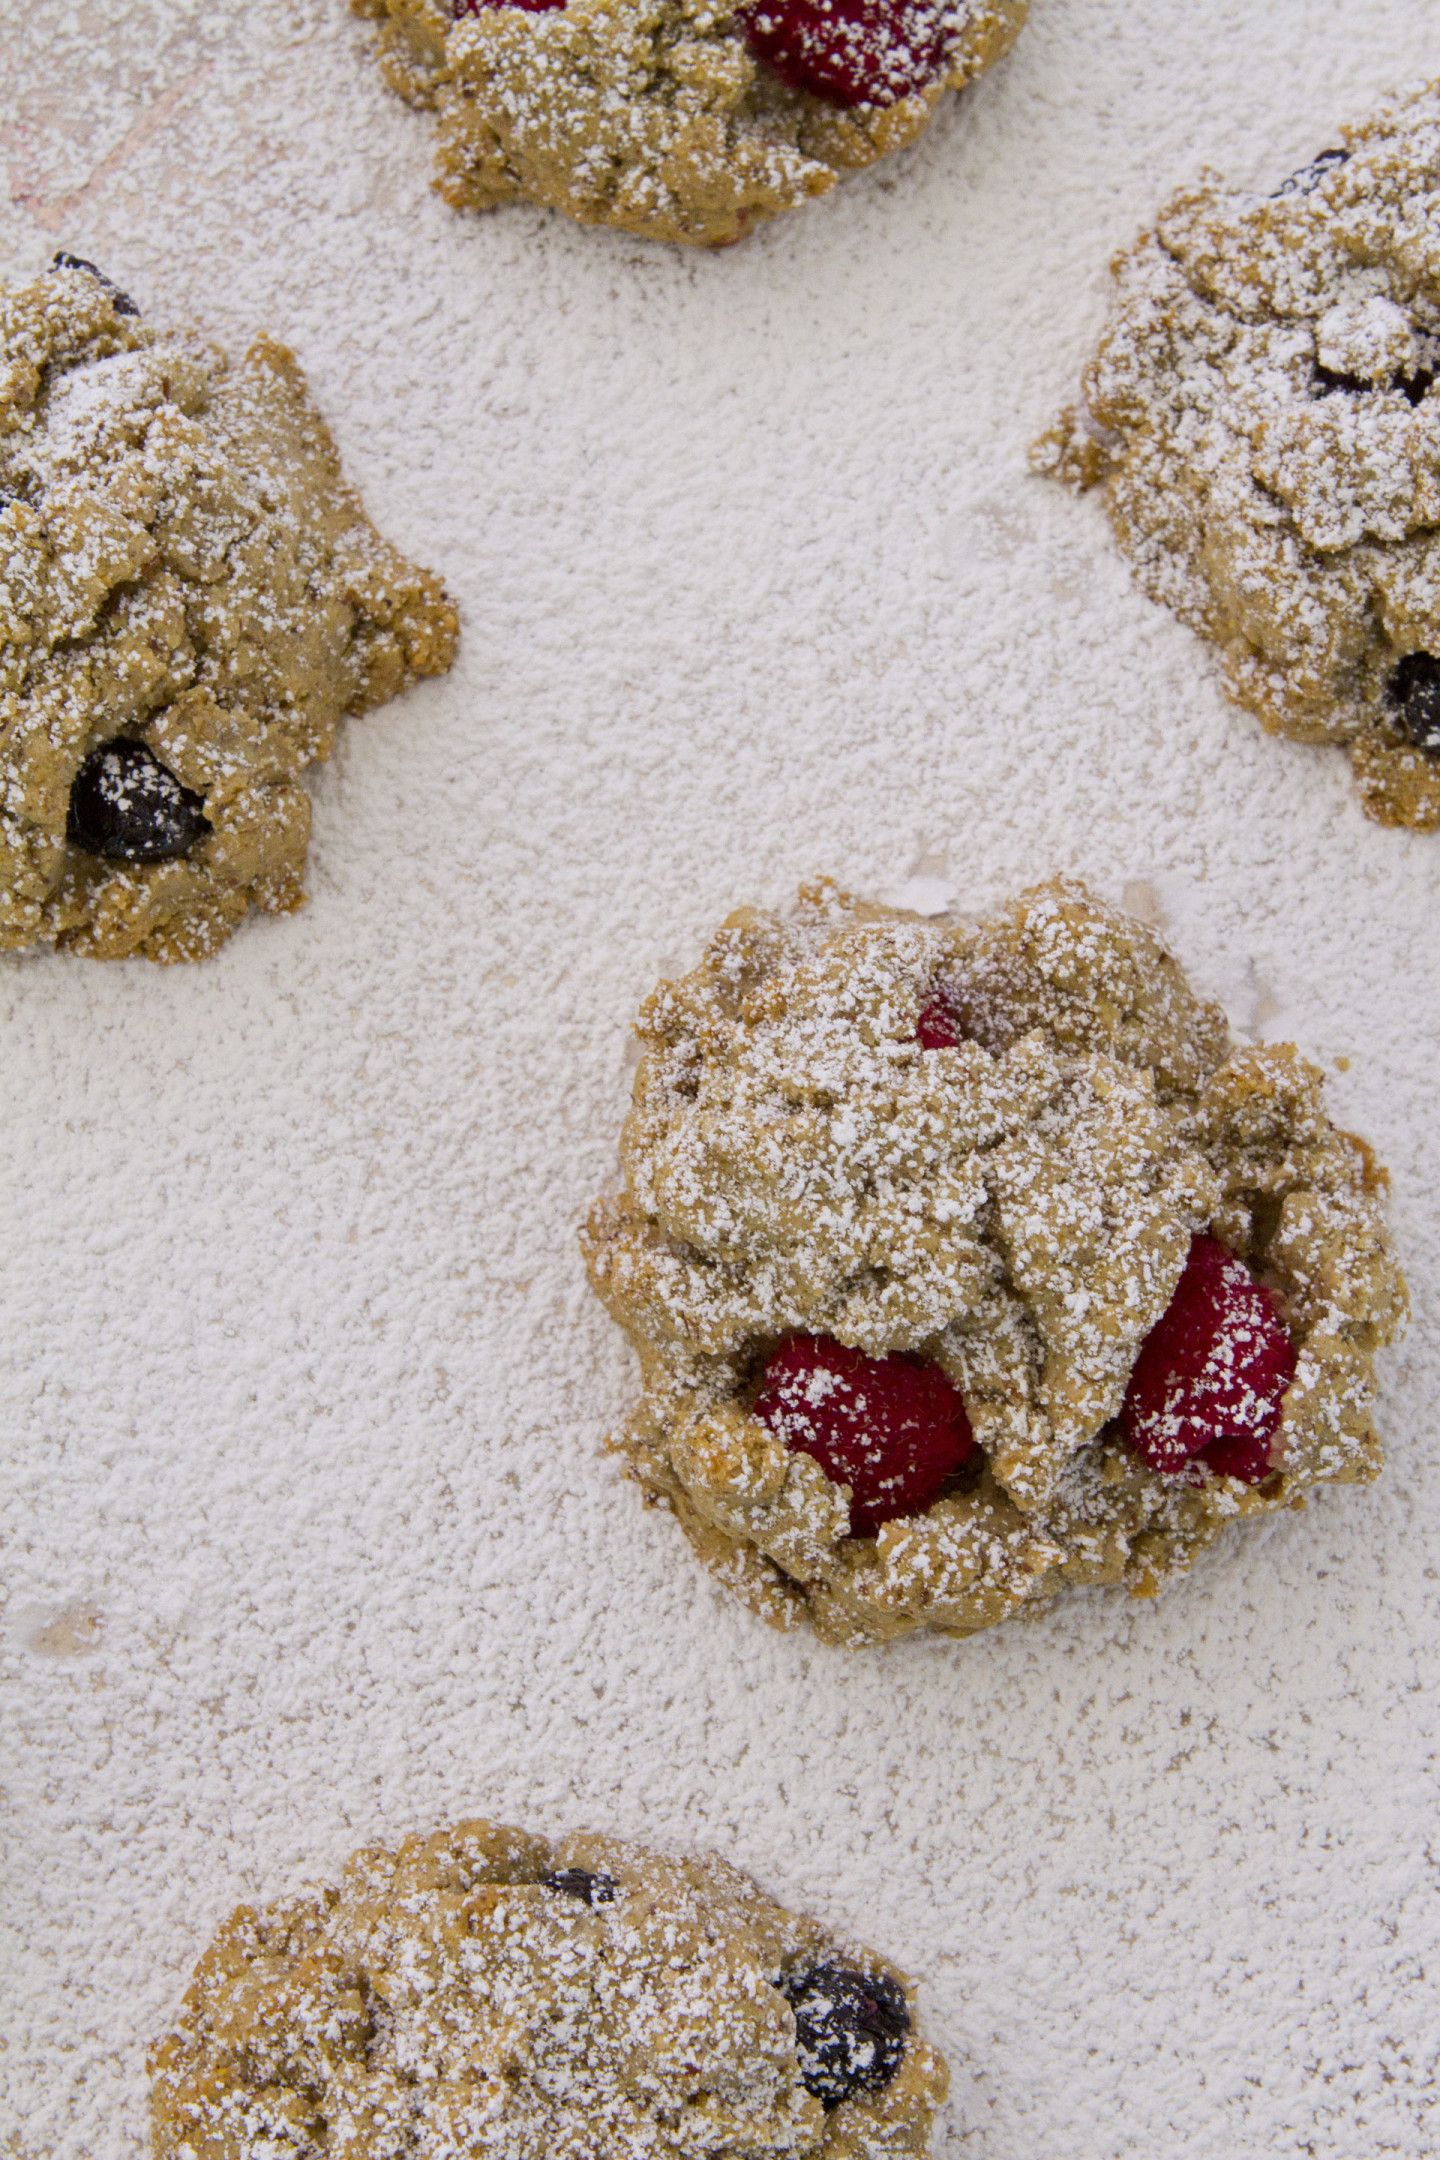 Gluten-free berry scones